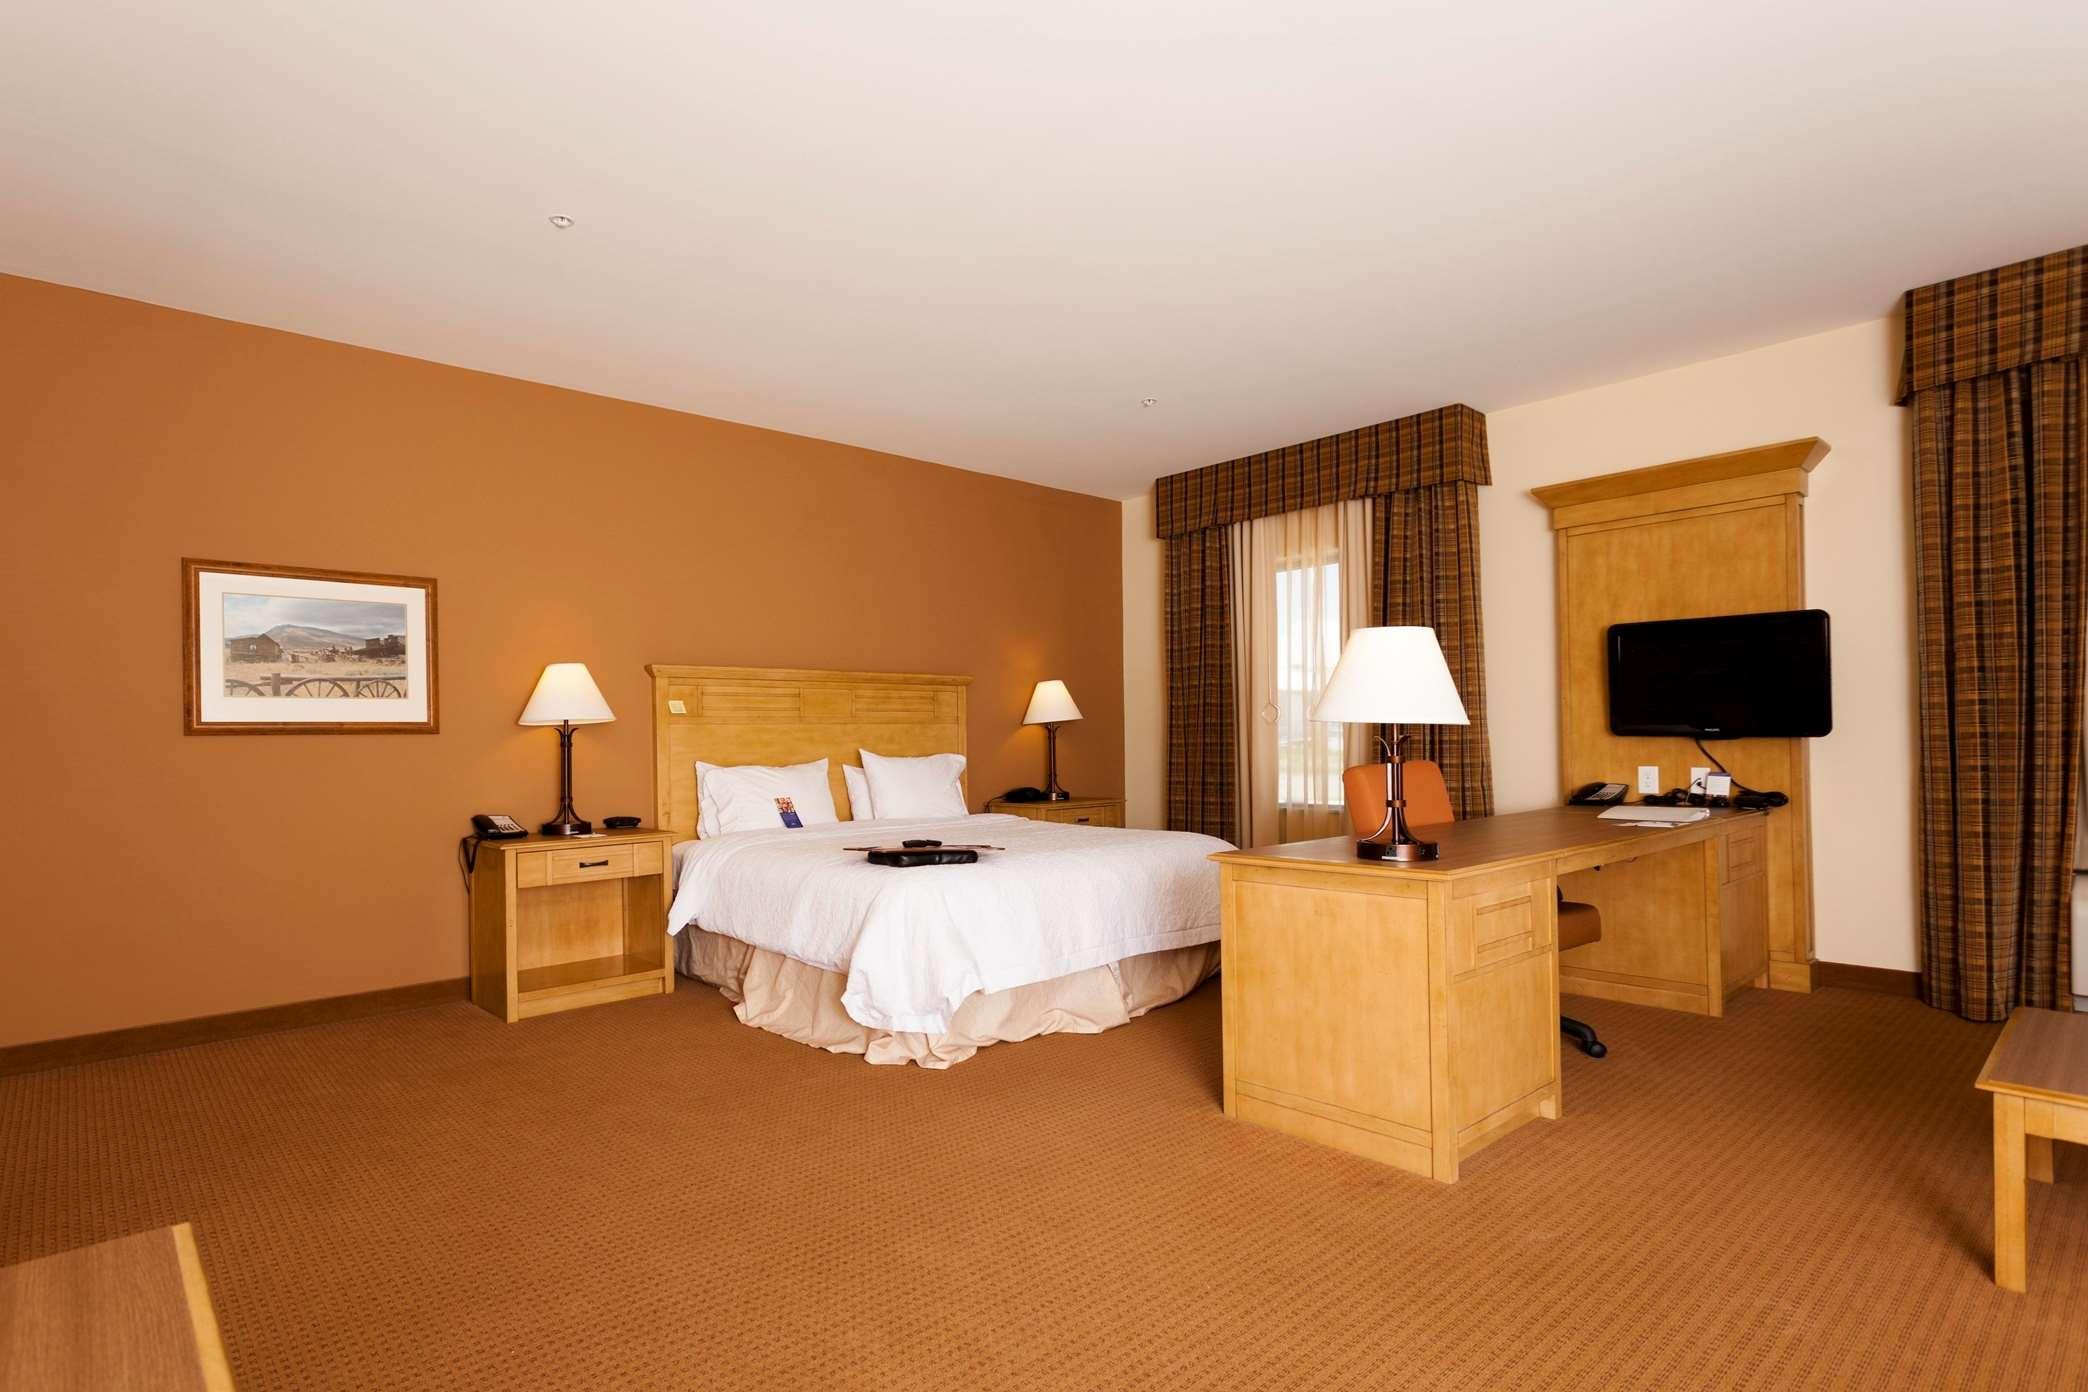 Hampton Inn & Suites Riverton image 17